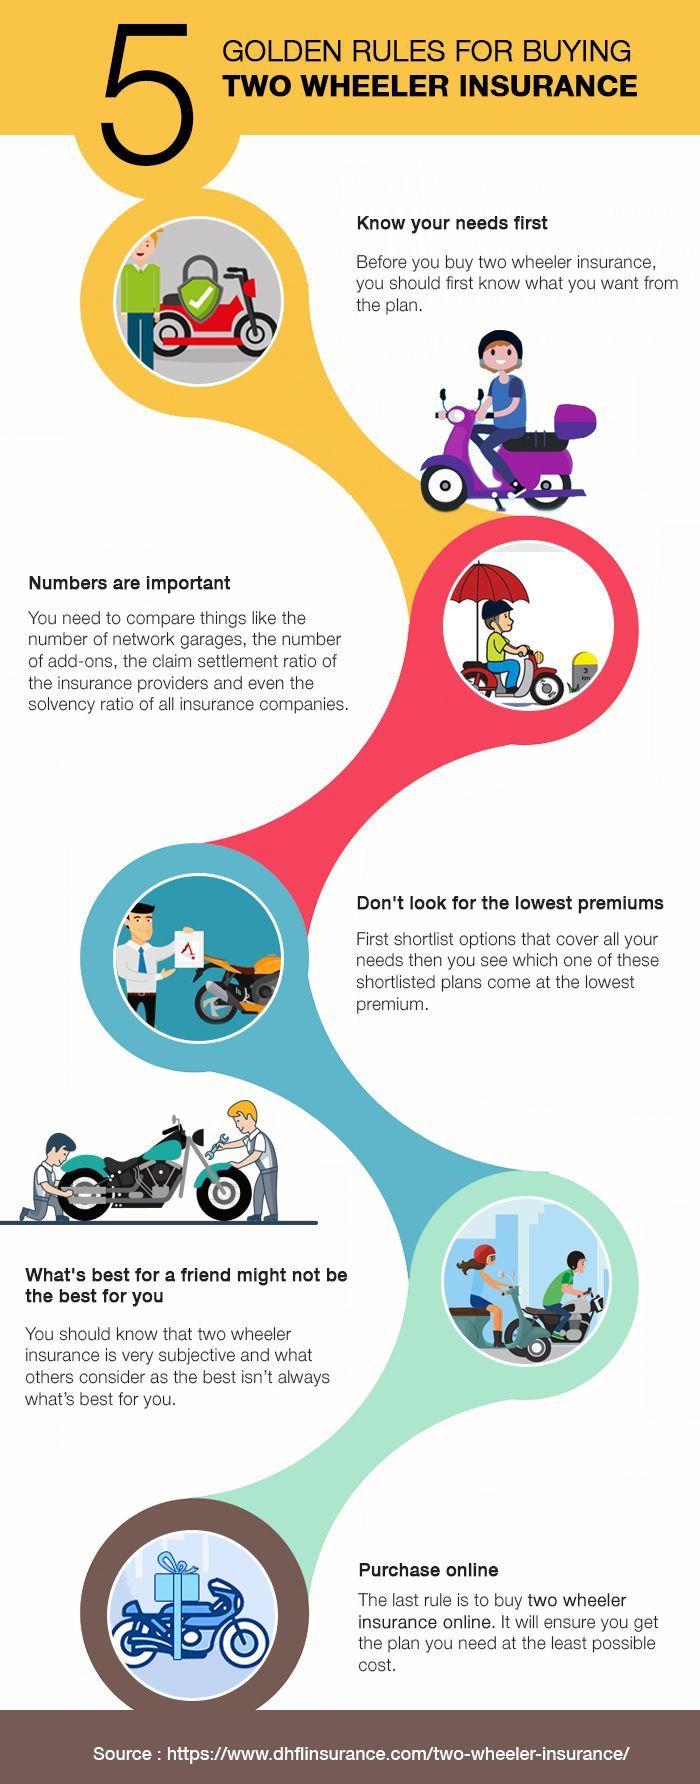 5 Golden Rules For Buying Two Wheeler Insurance Buying Golden Insurance Rules Wheeler Buy Or Renew Two Wheeler Insurance Online From Dhfl General Insuranc 2020